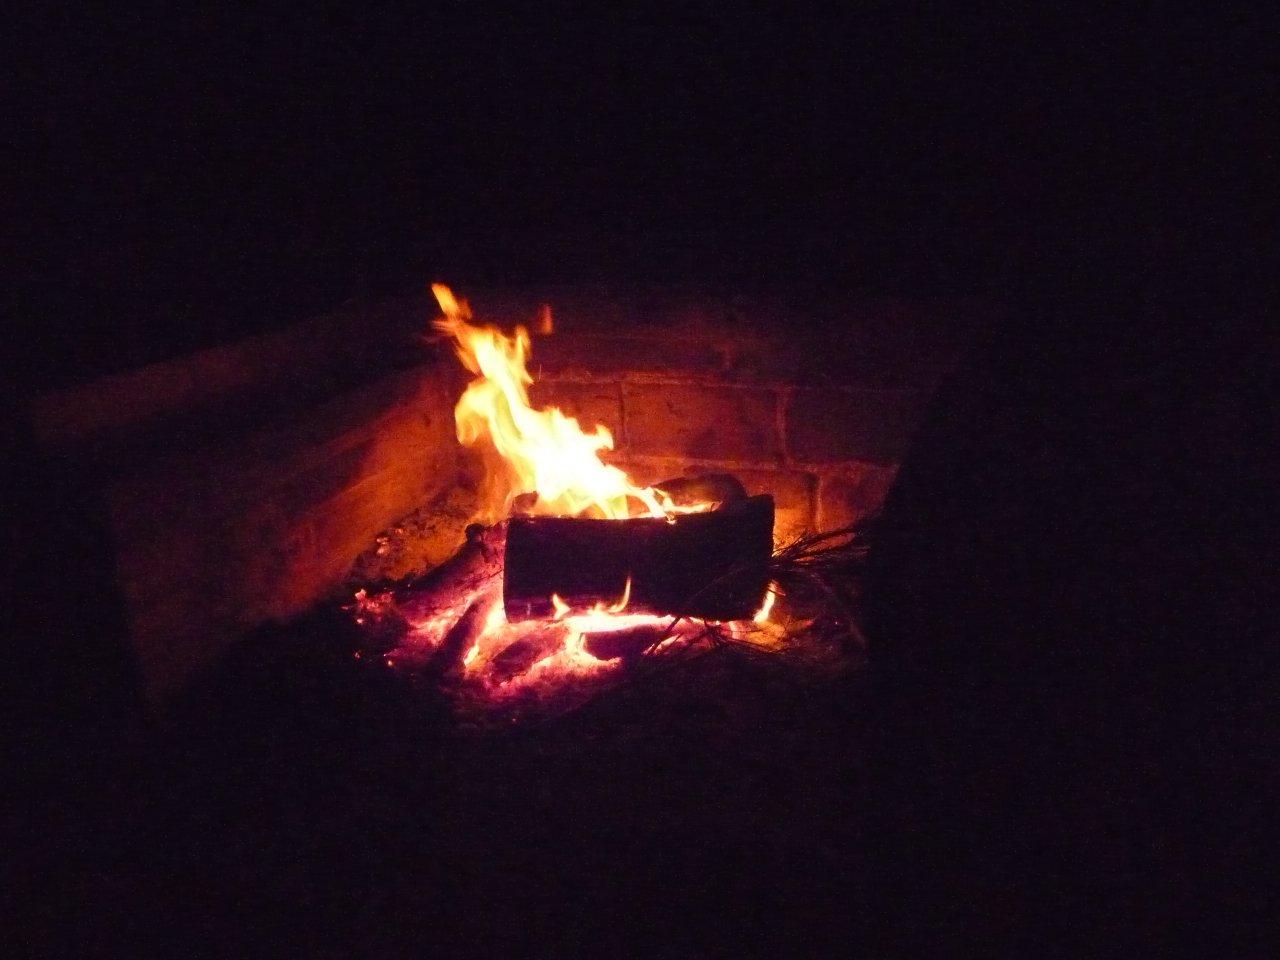 monastry puig maria fire